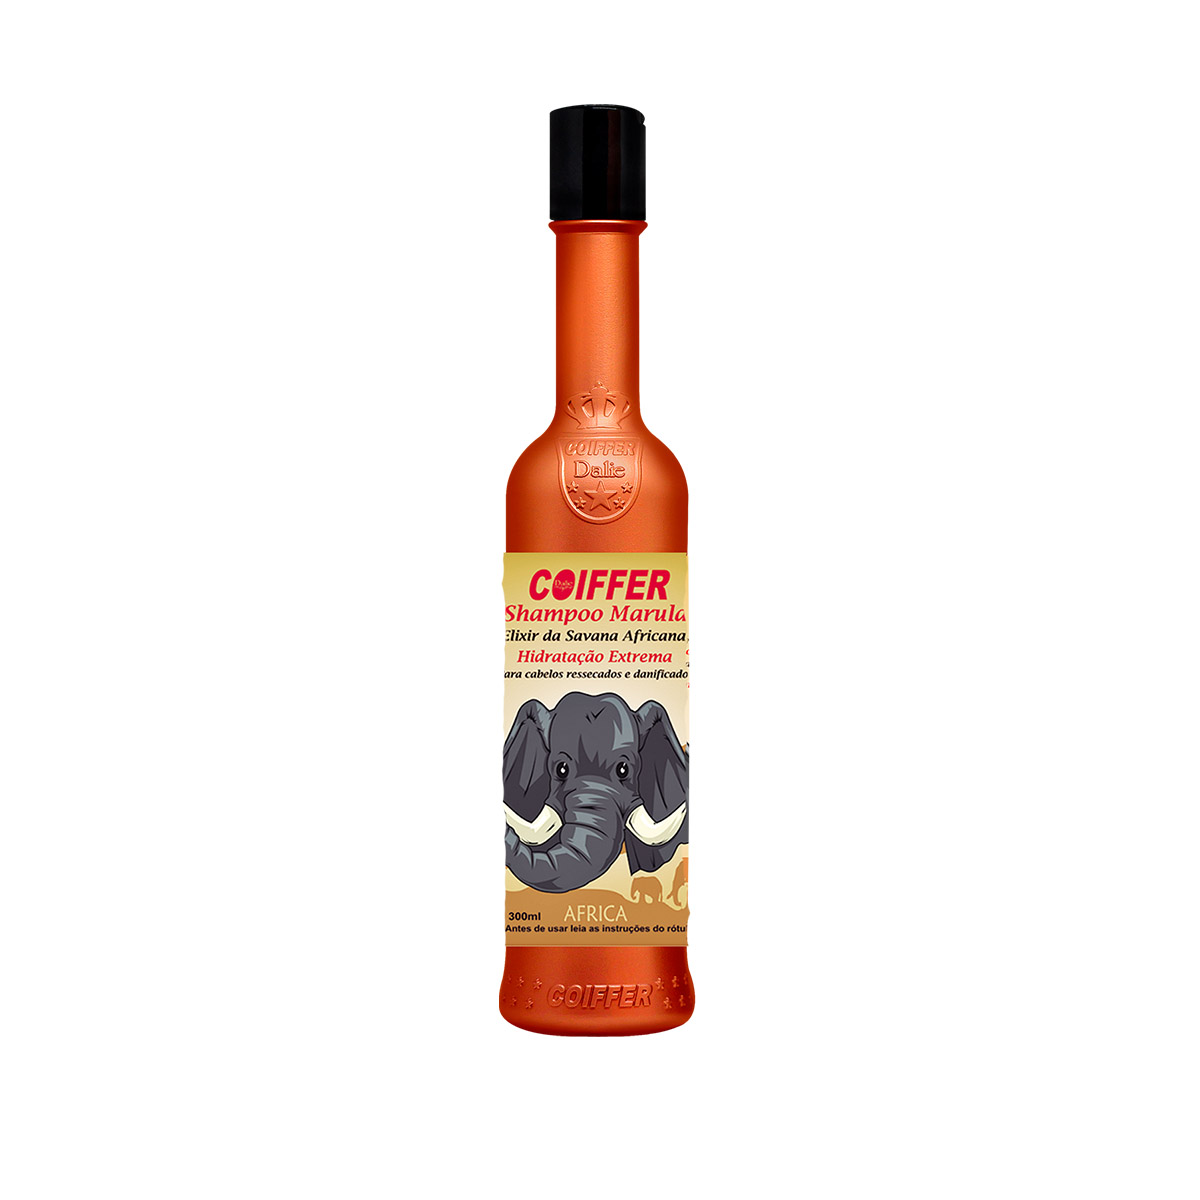 Shampoo Marula Elixir da Savana Coiffer 300ml